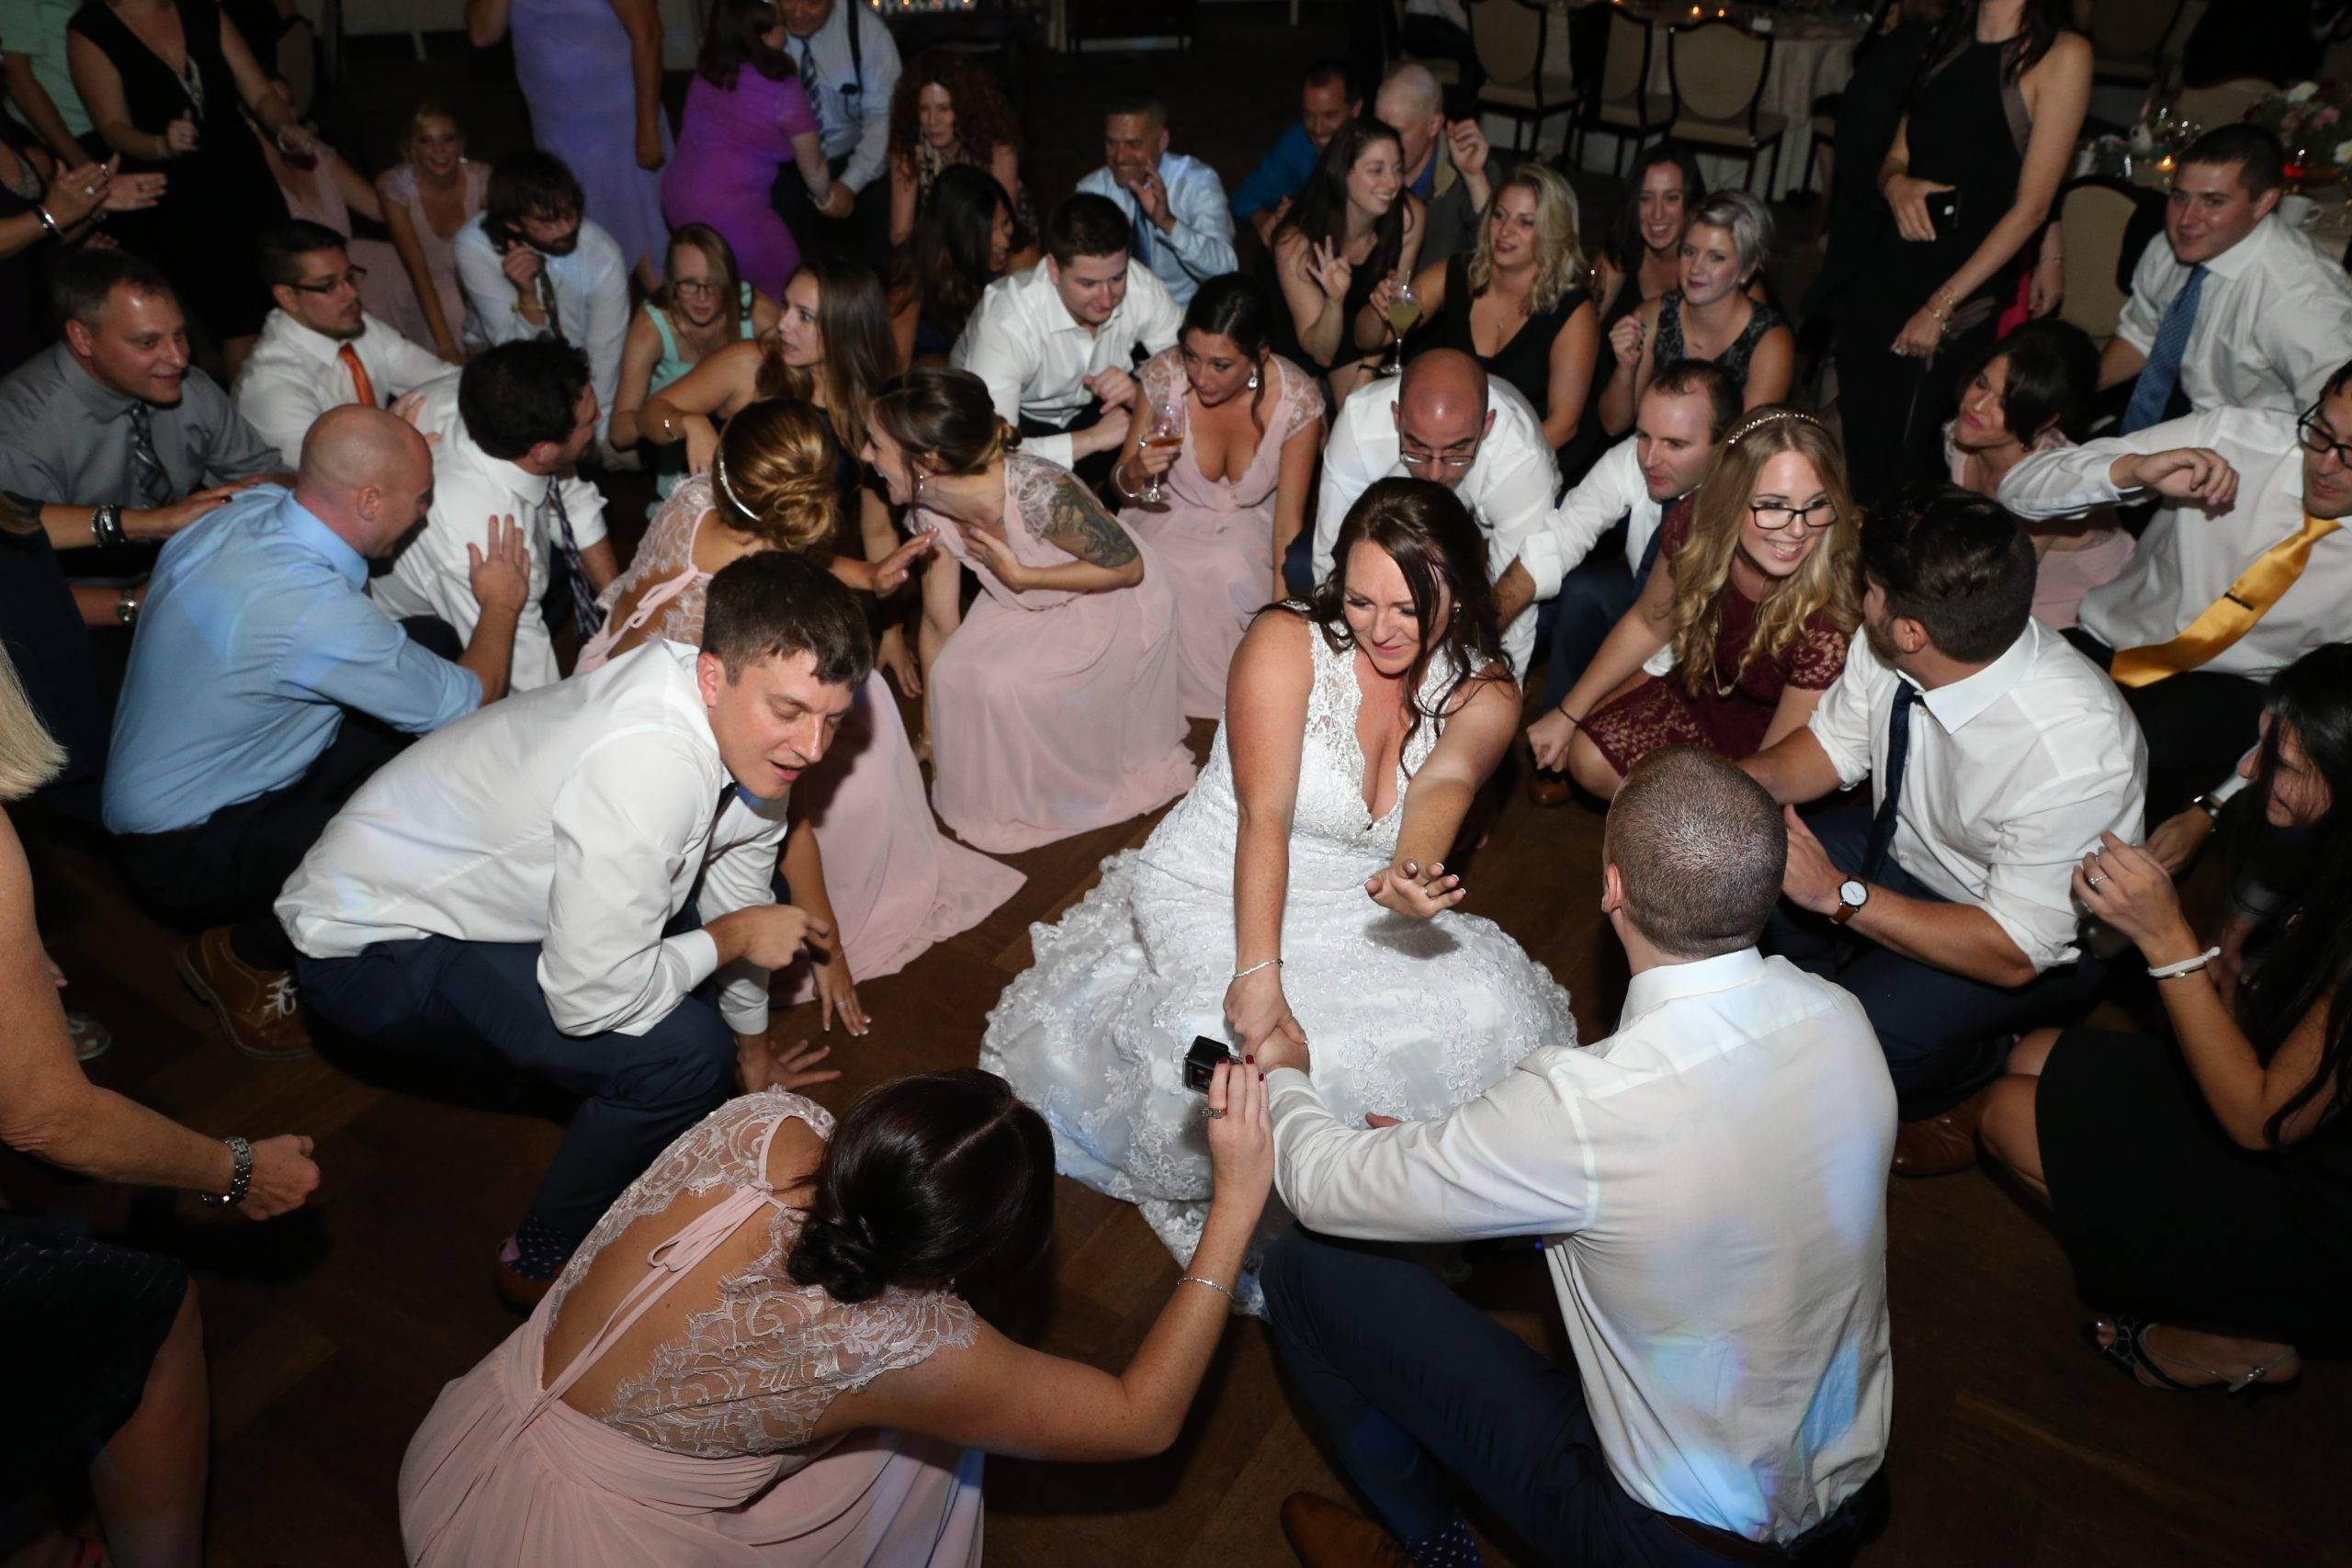 Park Savoy bride dancing at her wedding